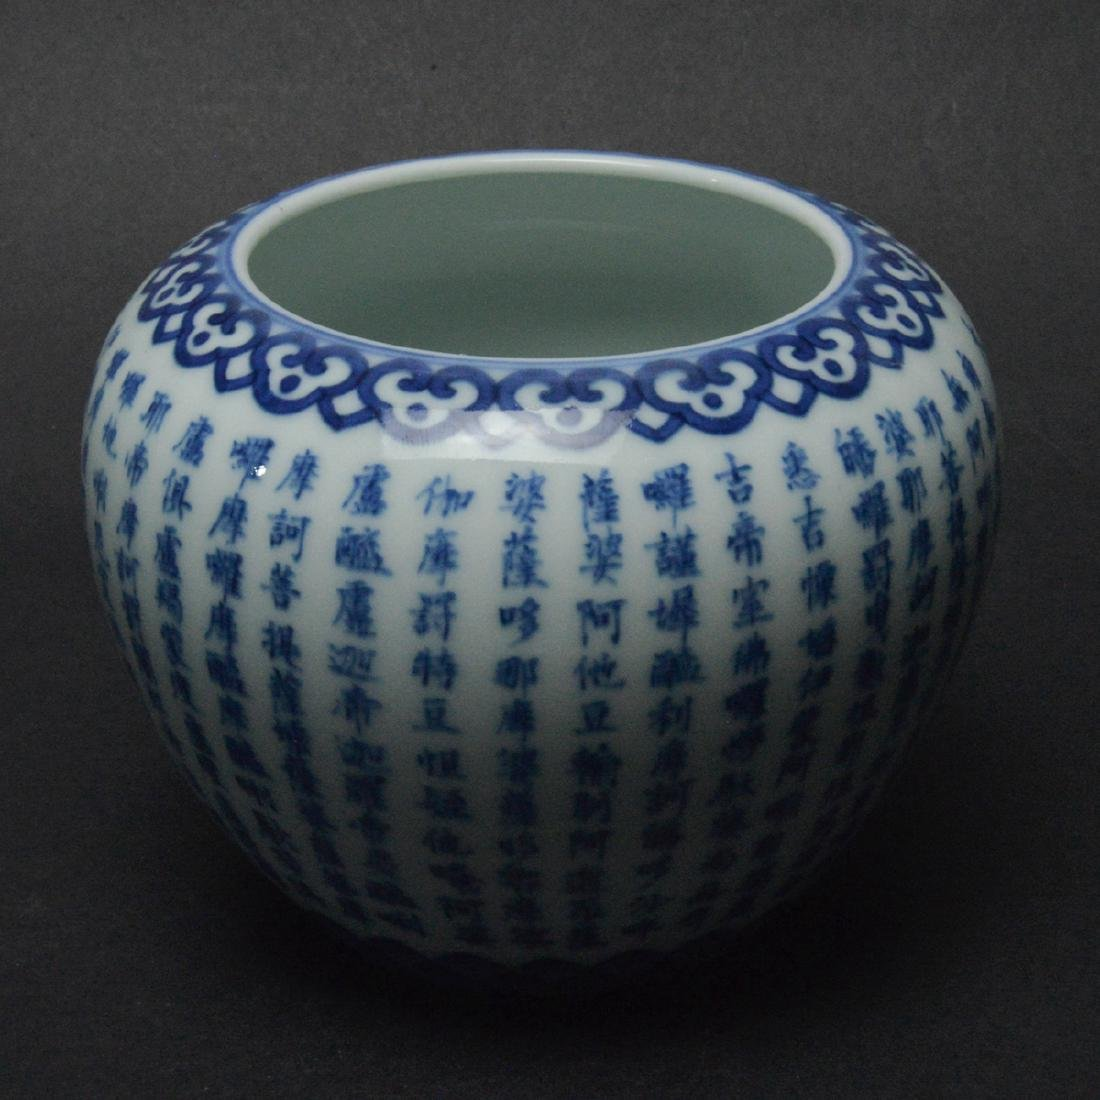 CHINESE BLUE AND WHITE PORCELAIN BRUSH WASHER - 4